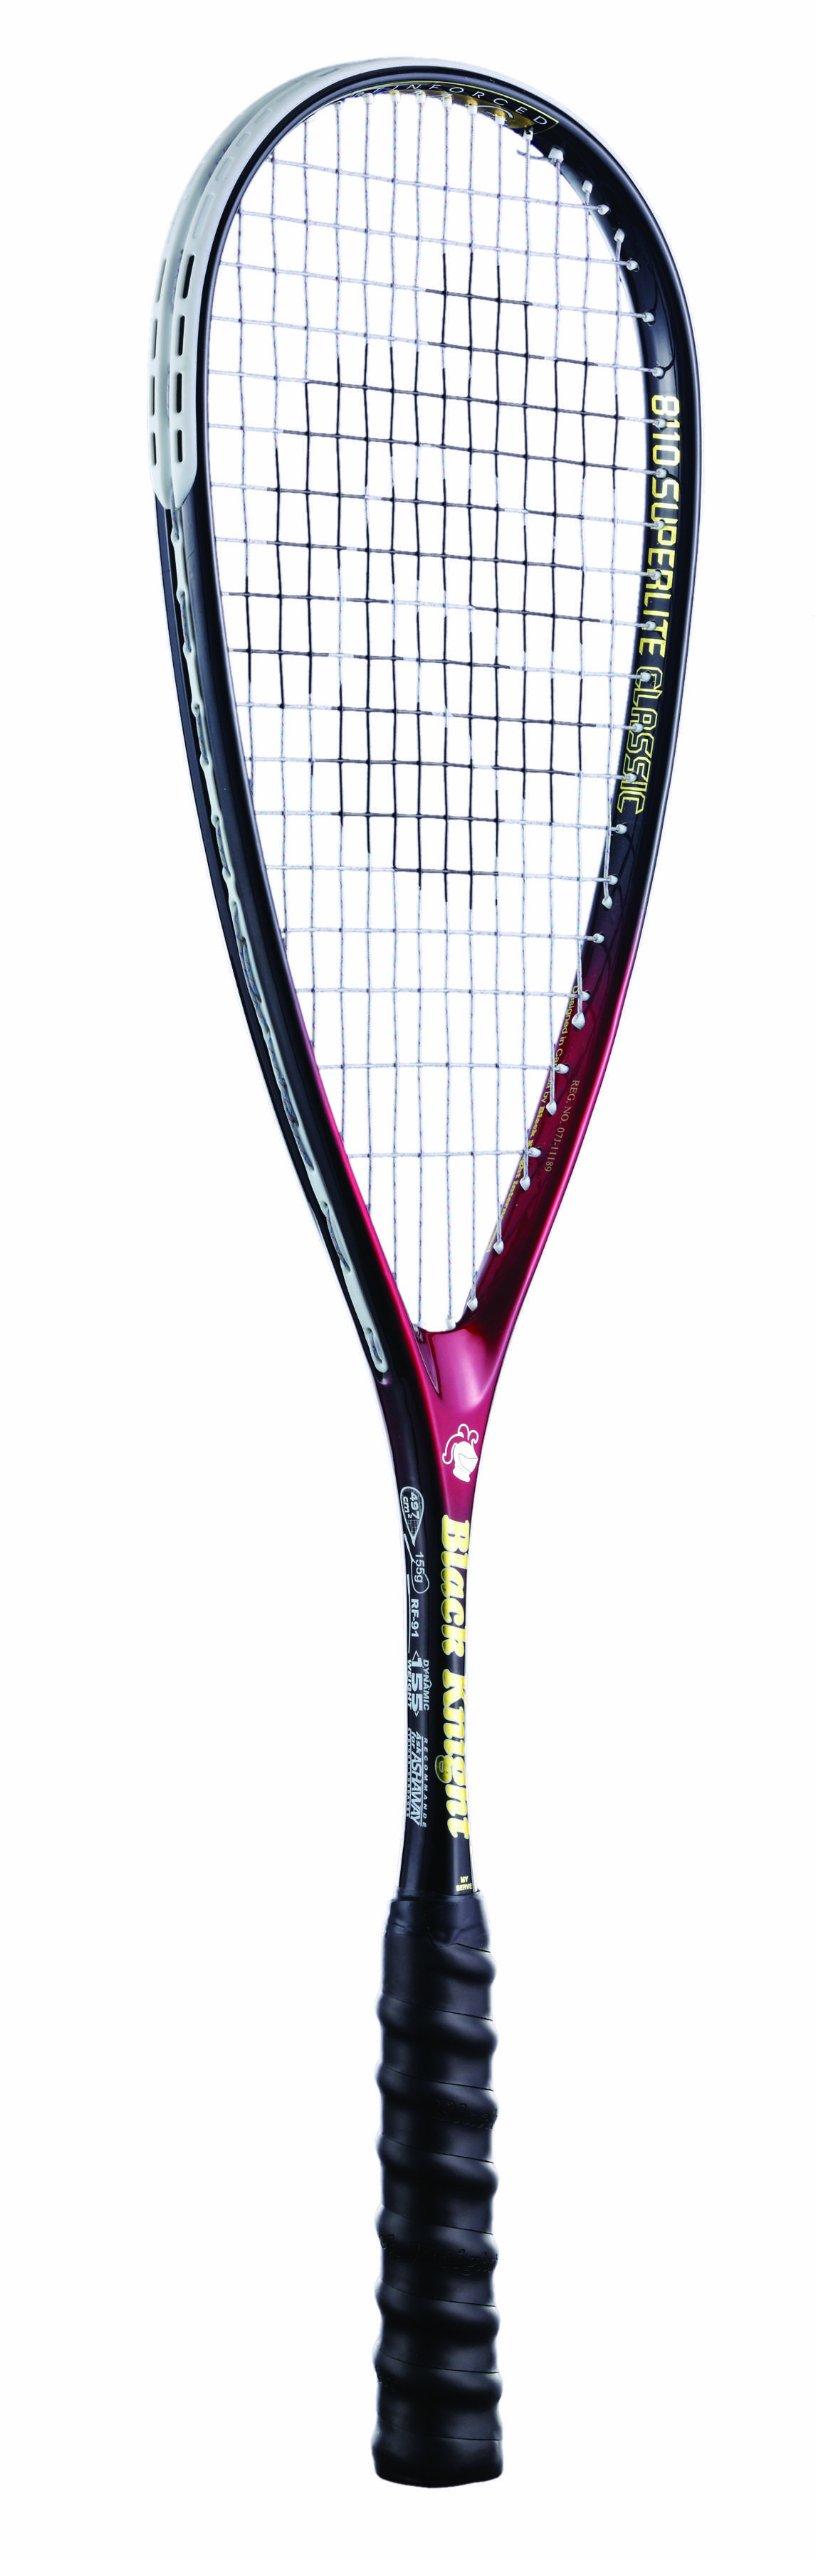 Black Knight 8110 Classic Squash Racquet - Classic Series